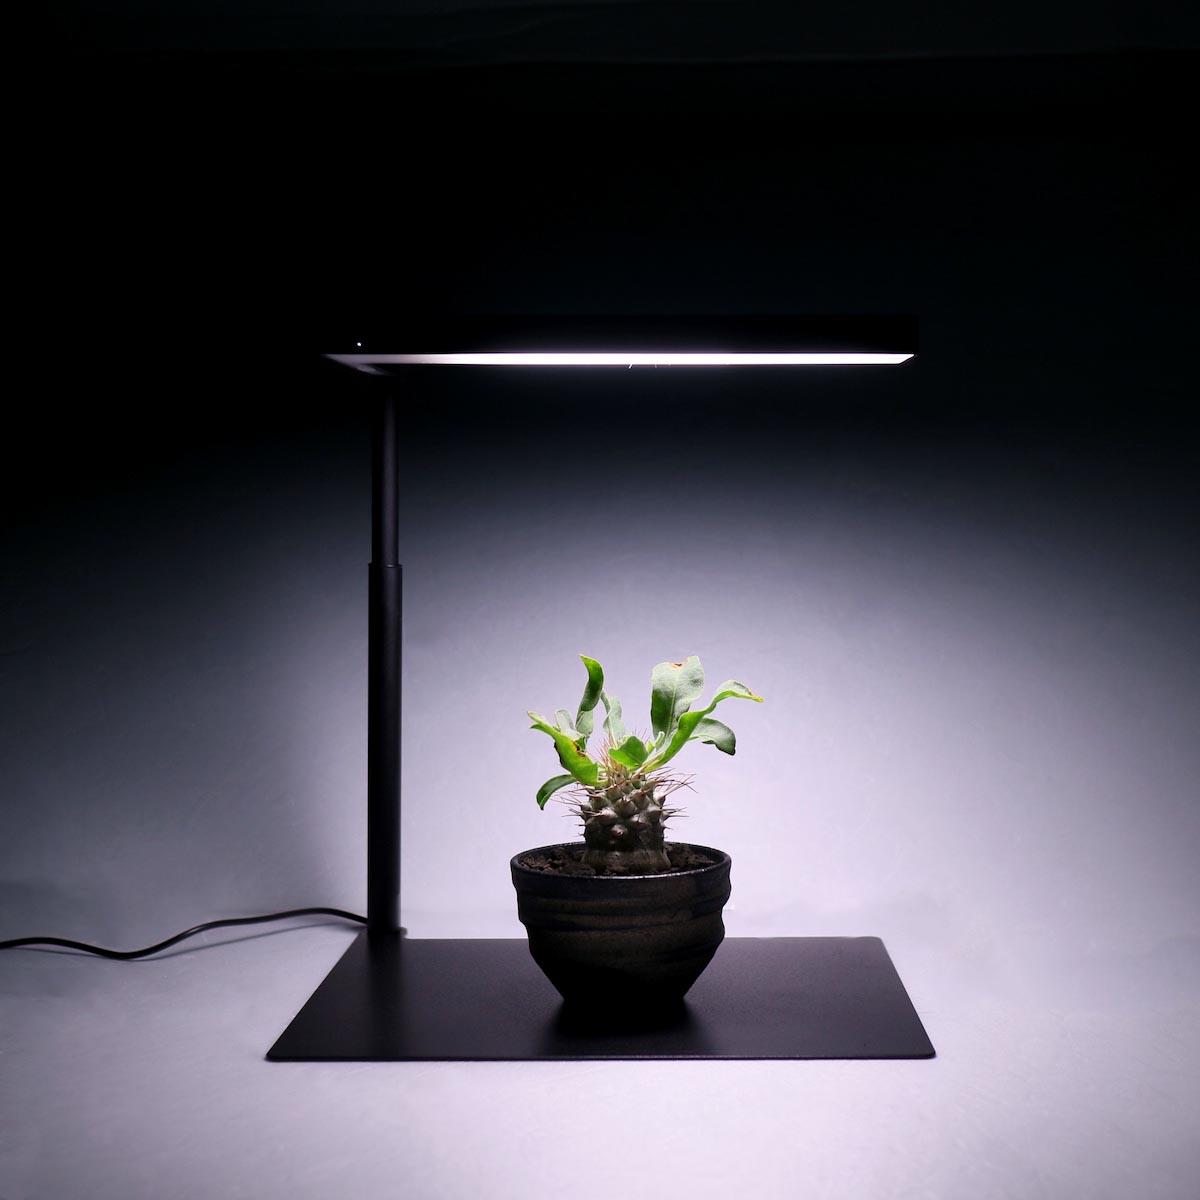 BOTANIZE / EXOTIC PLANT CULTIVATION LIGHT TOP